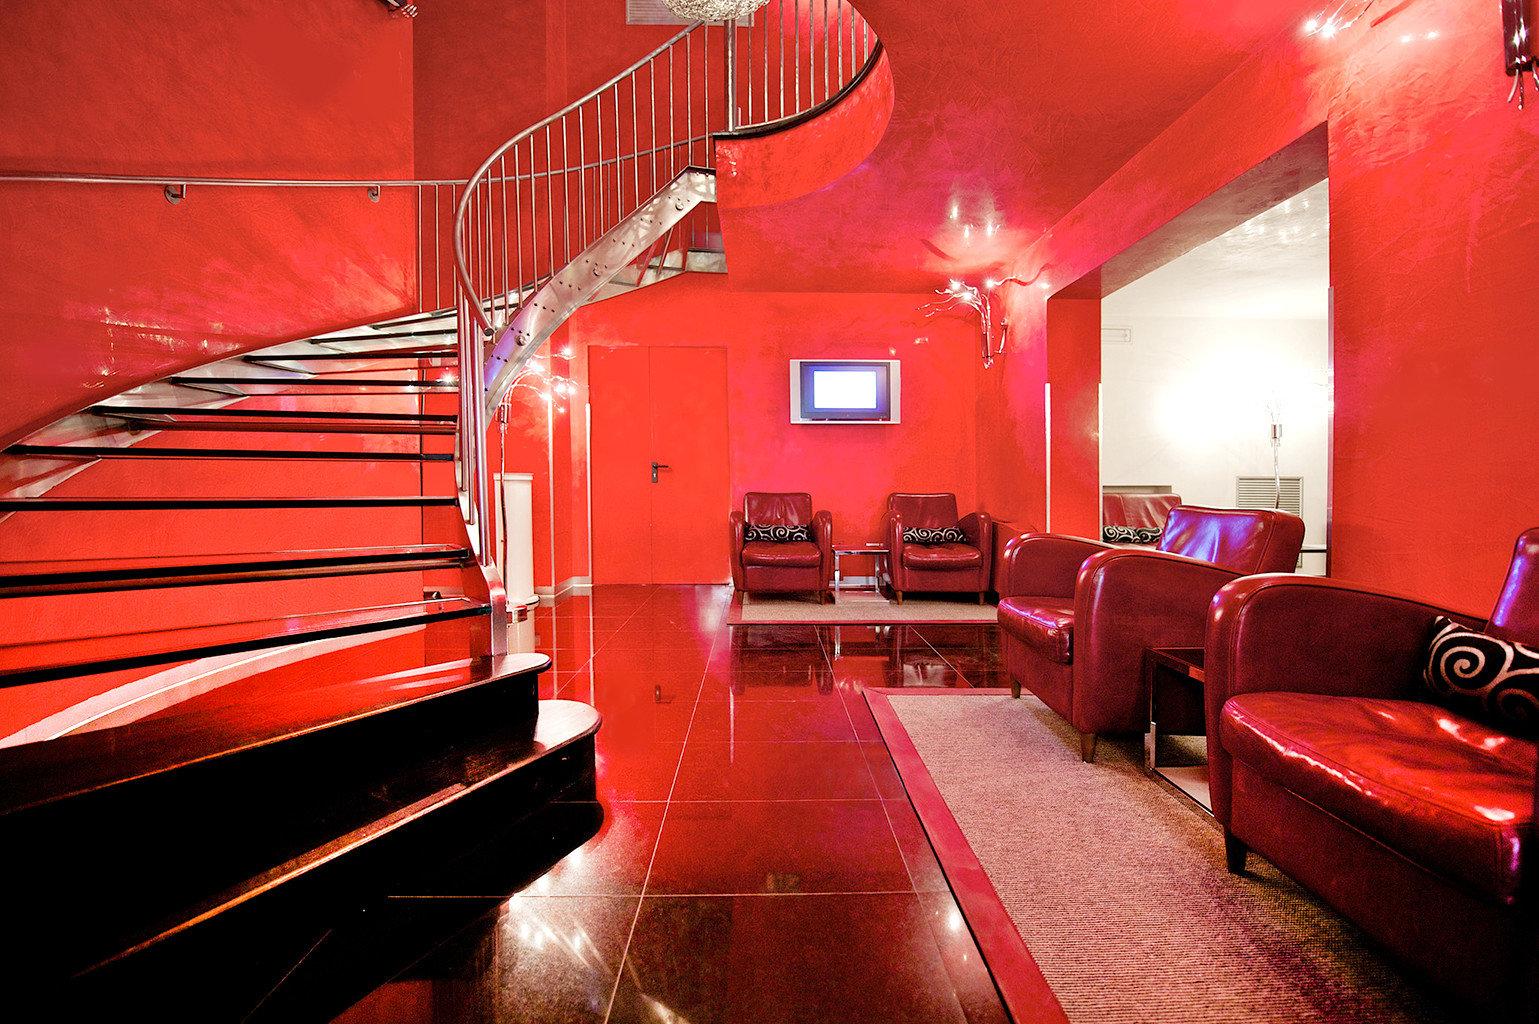 City Lobby Modern color red restaurant